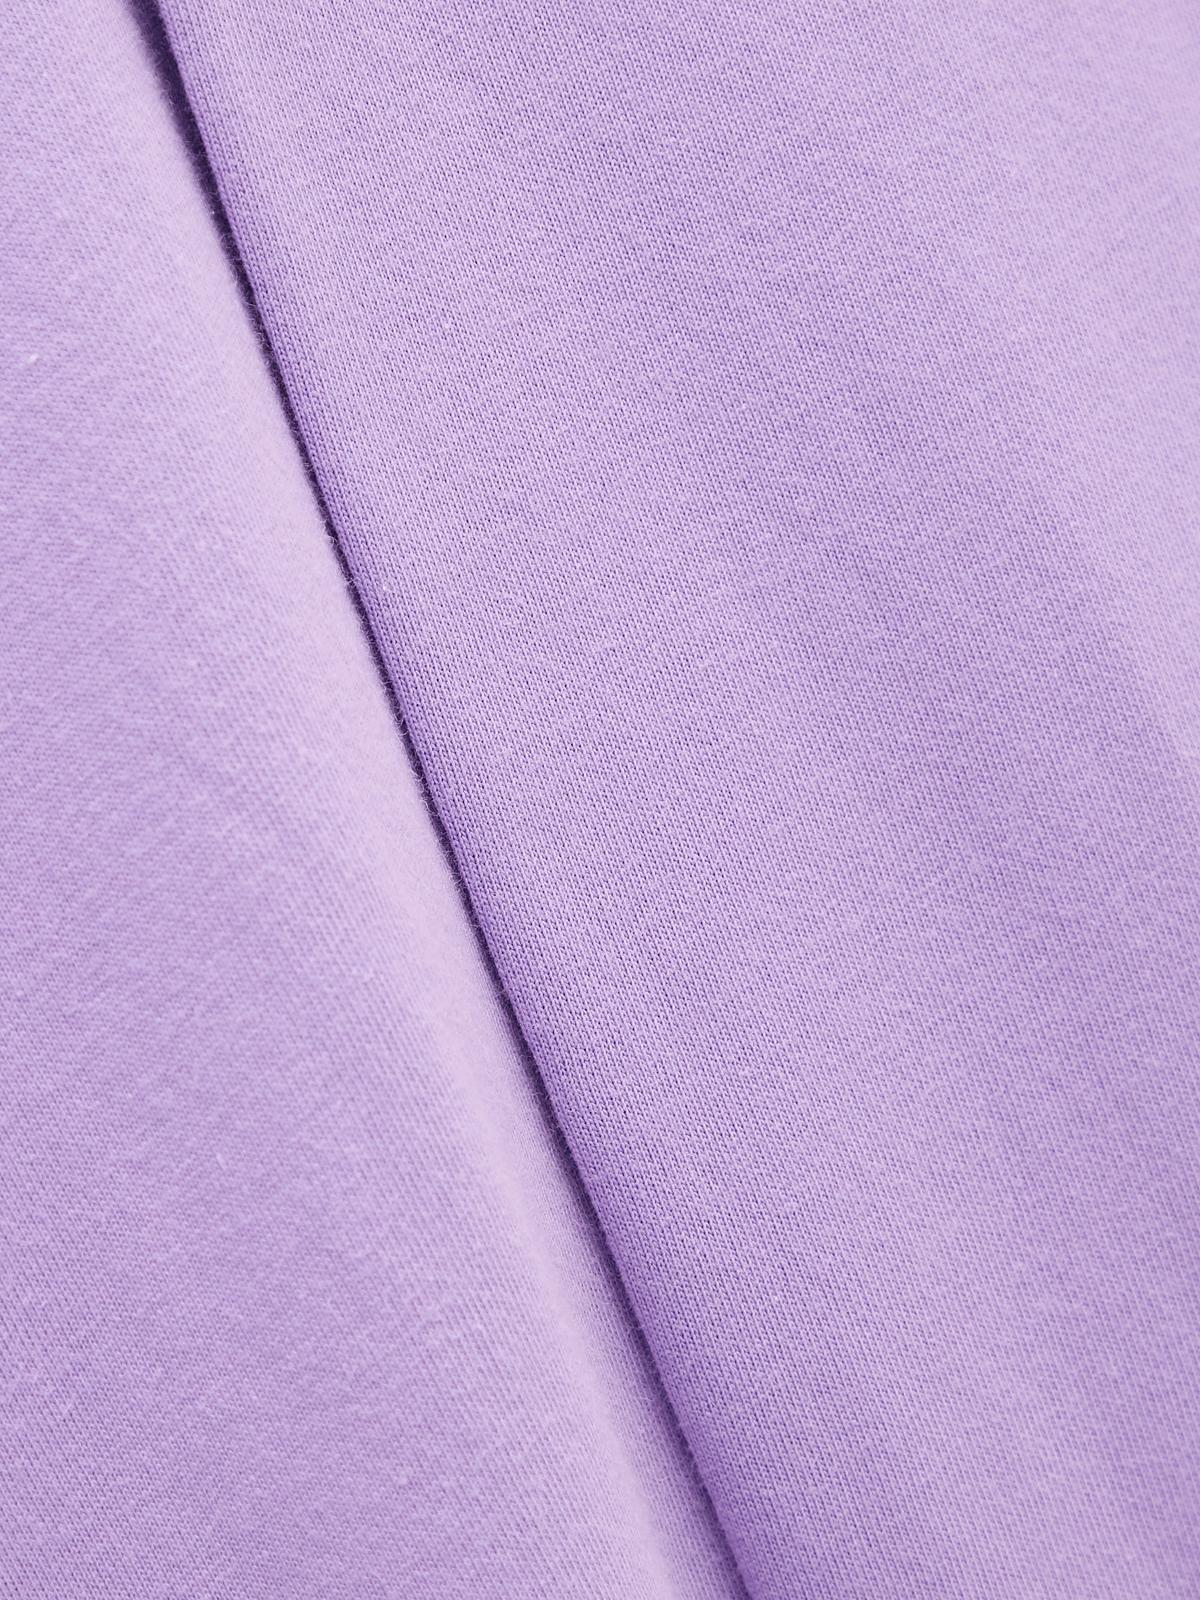 Neck Cut Out Asymmetrical Tee Purple